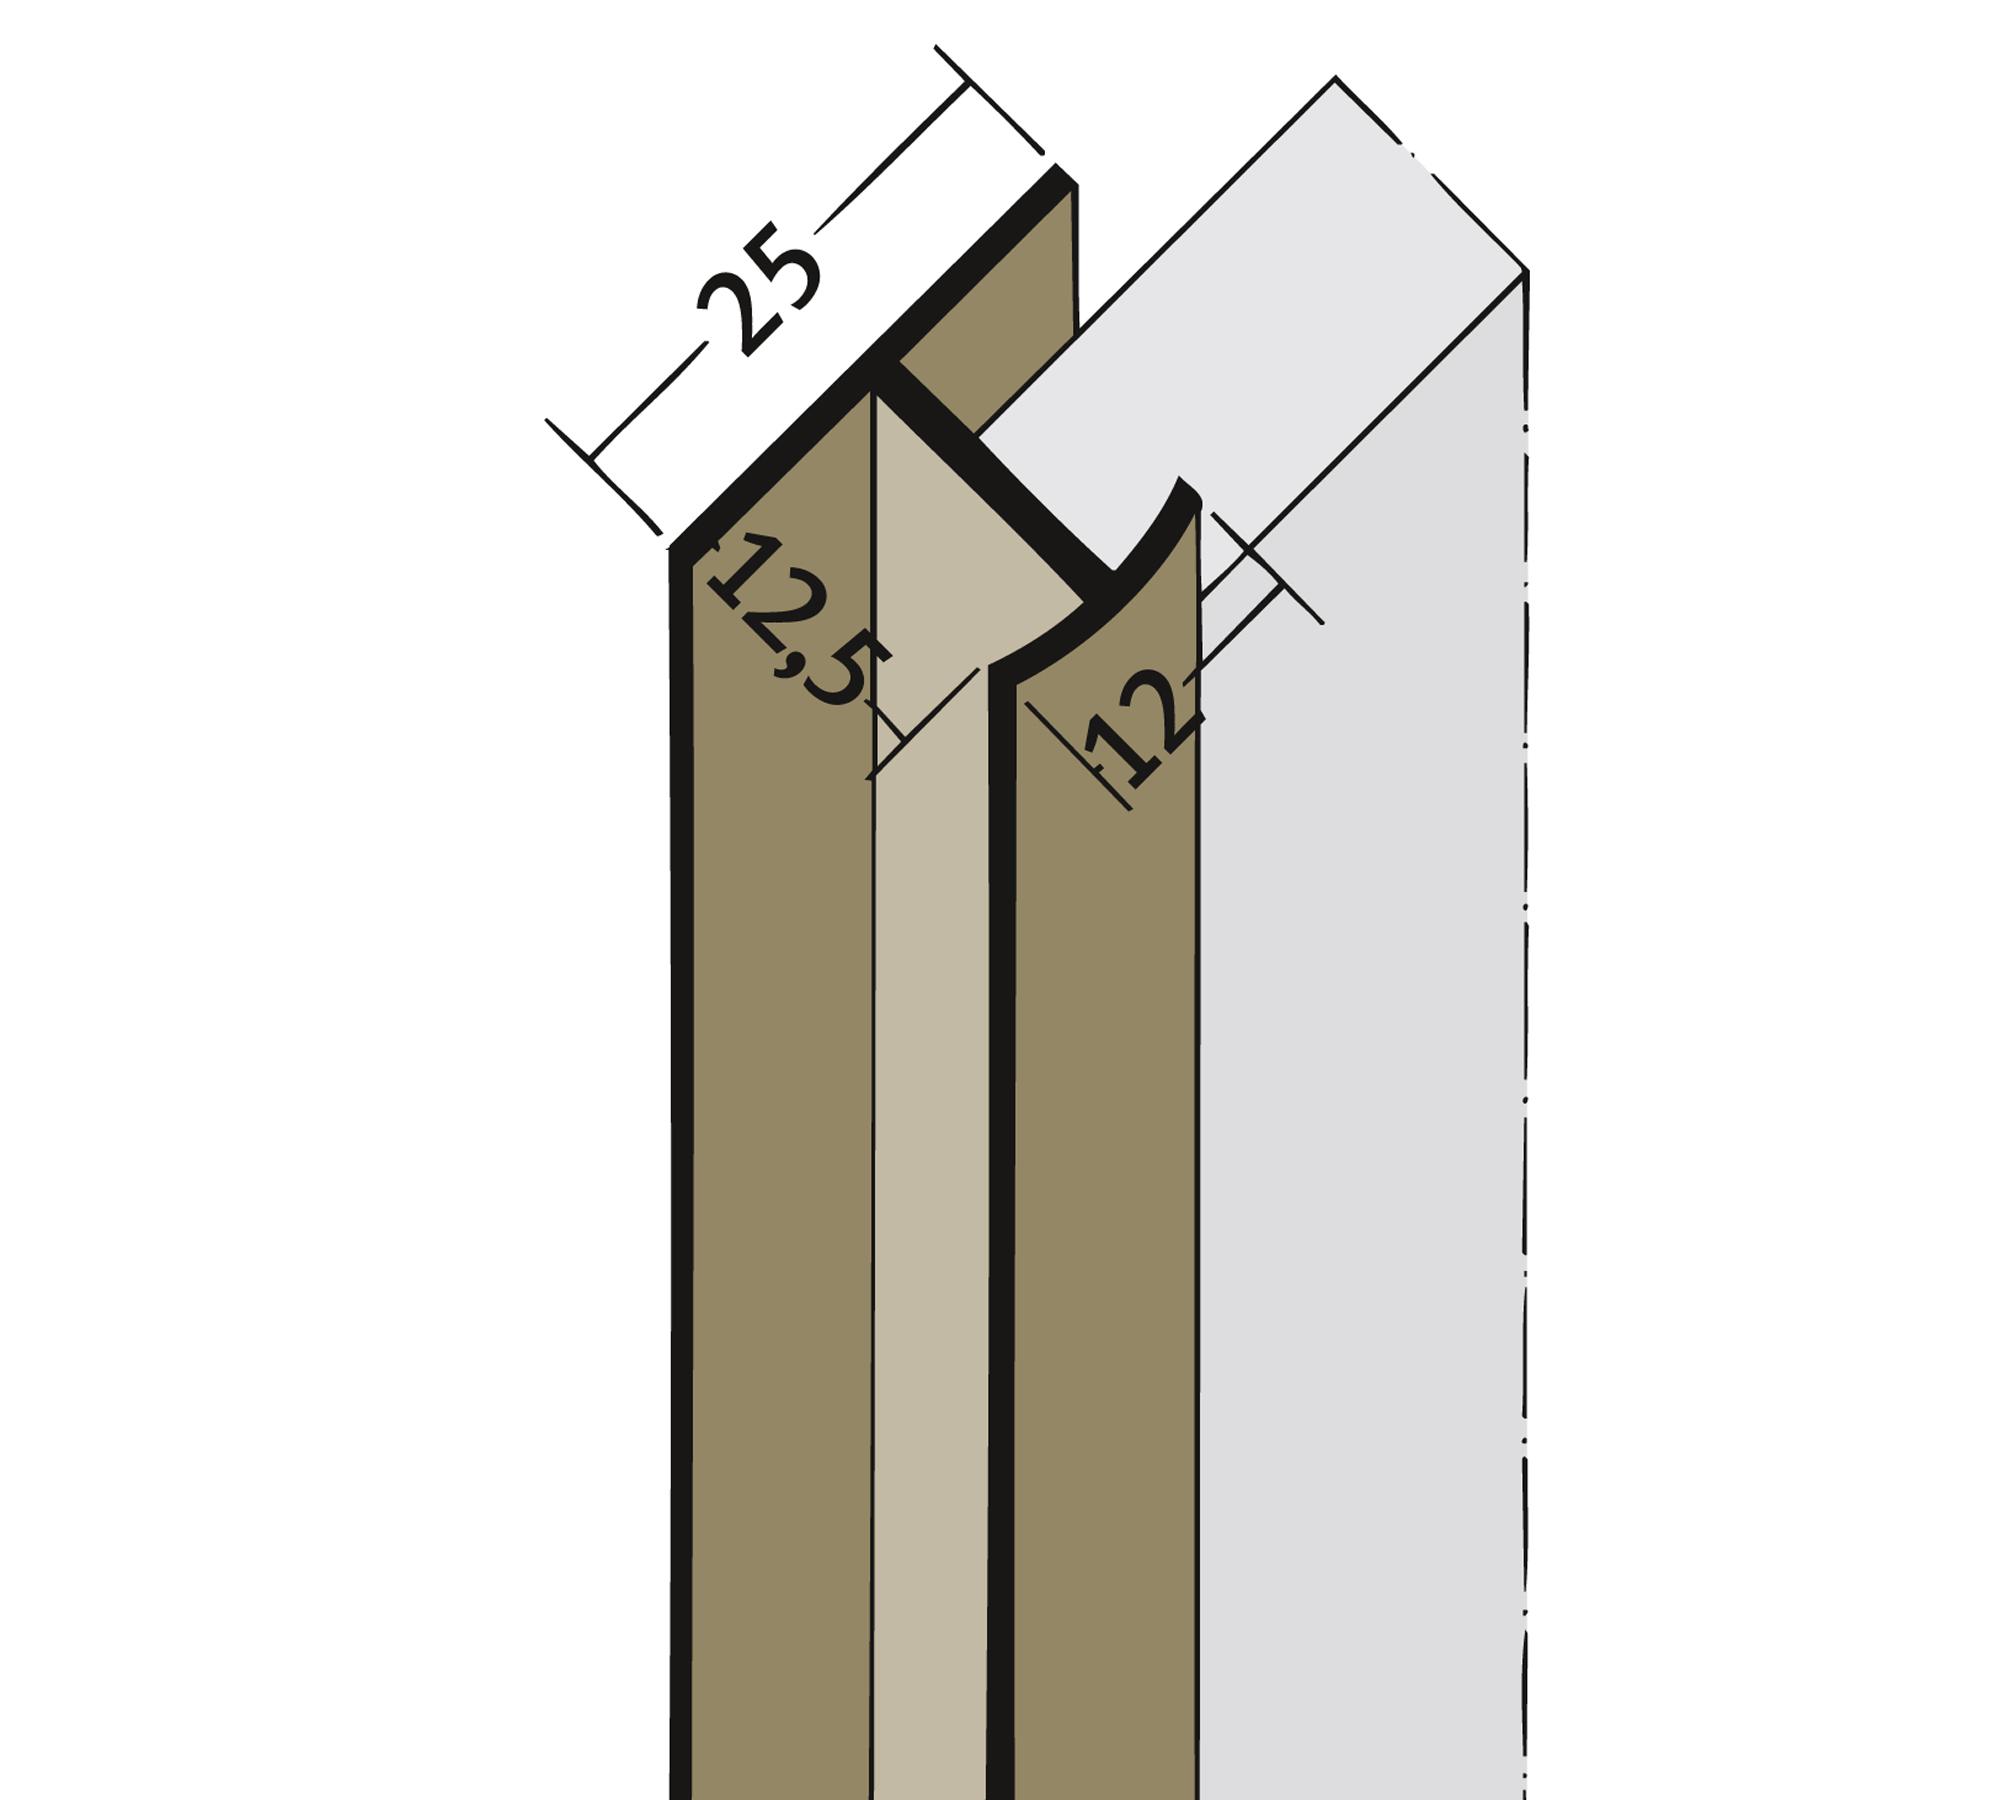 protektor doppel t profil 3548 pvc wei 2500 mm. Black Bedroom Furniture Sets. Home Design Ideas